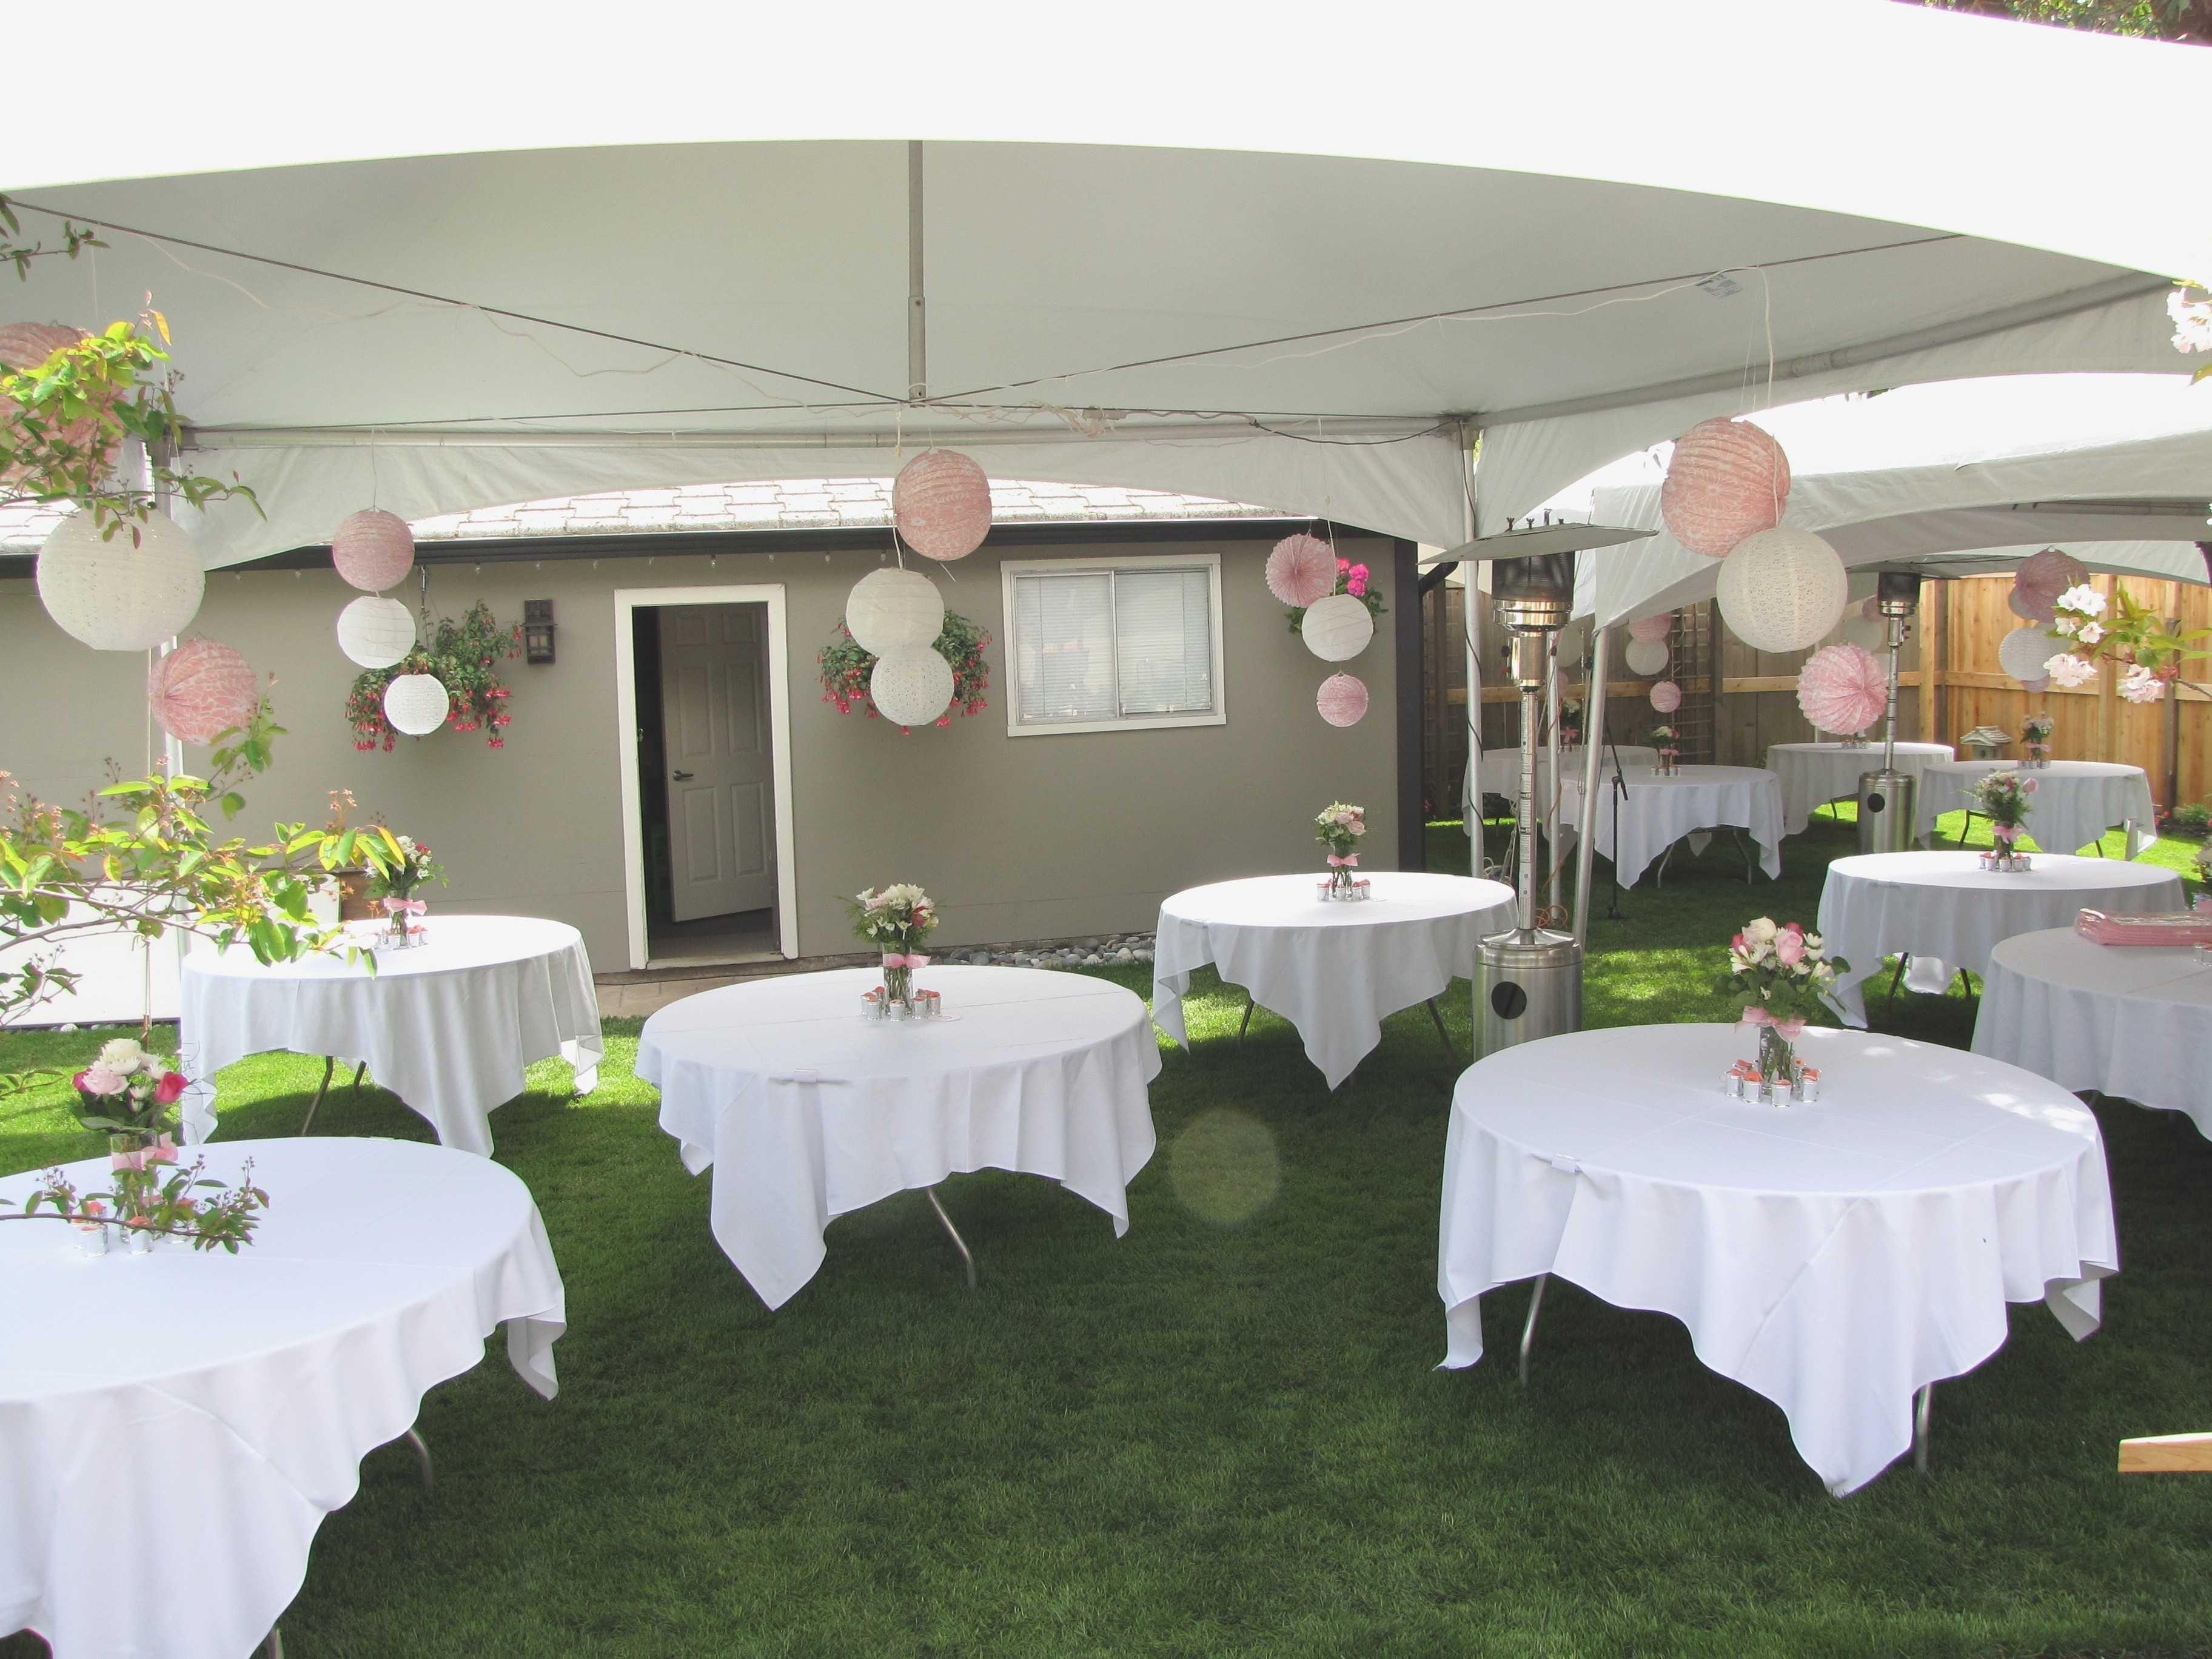 10 Unique Wedding Reception Ideas On A Budget backyard wedding reception ideas on a budget best of fabulous bud 2020